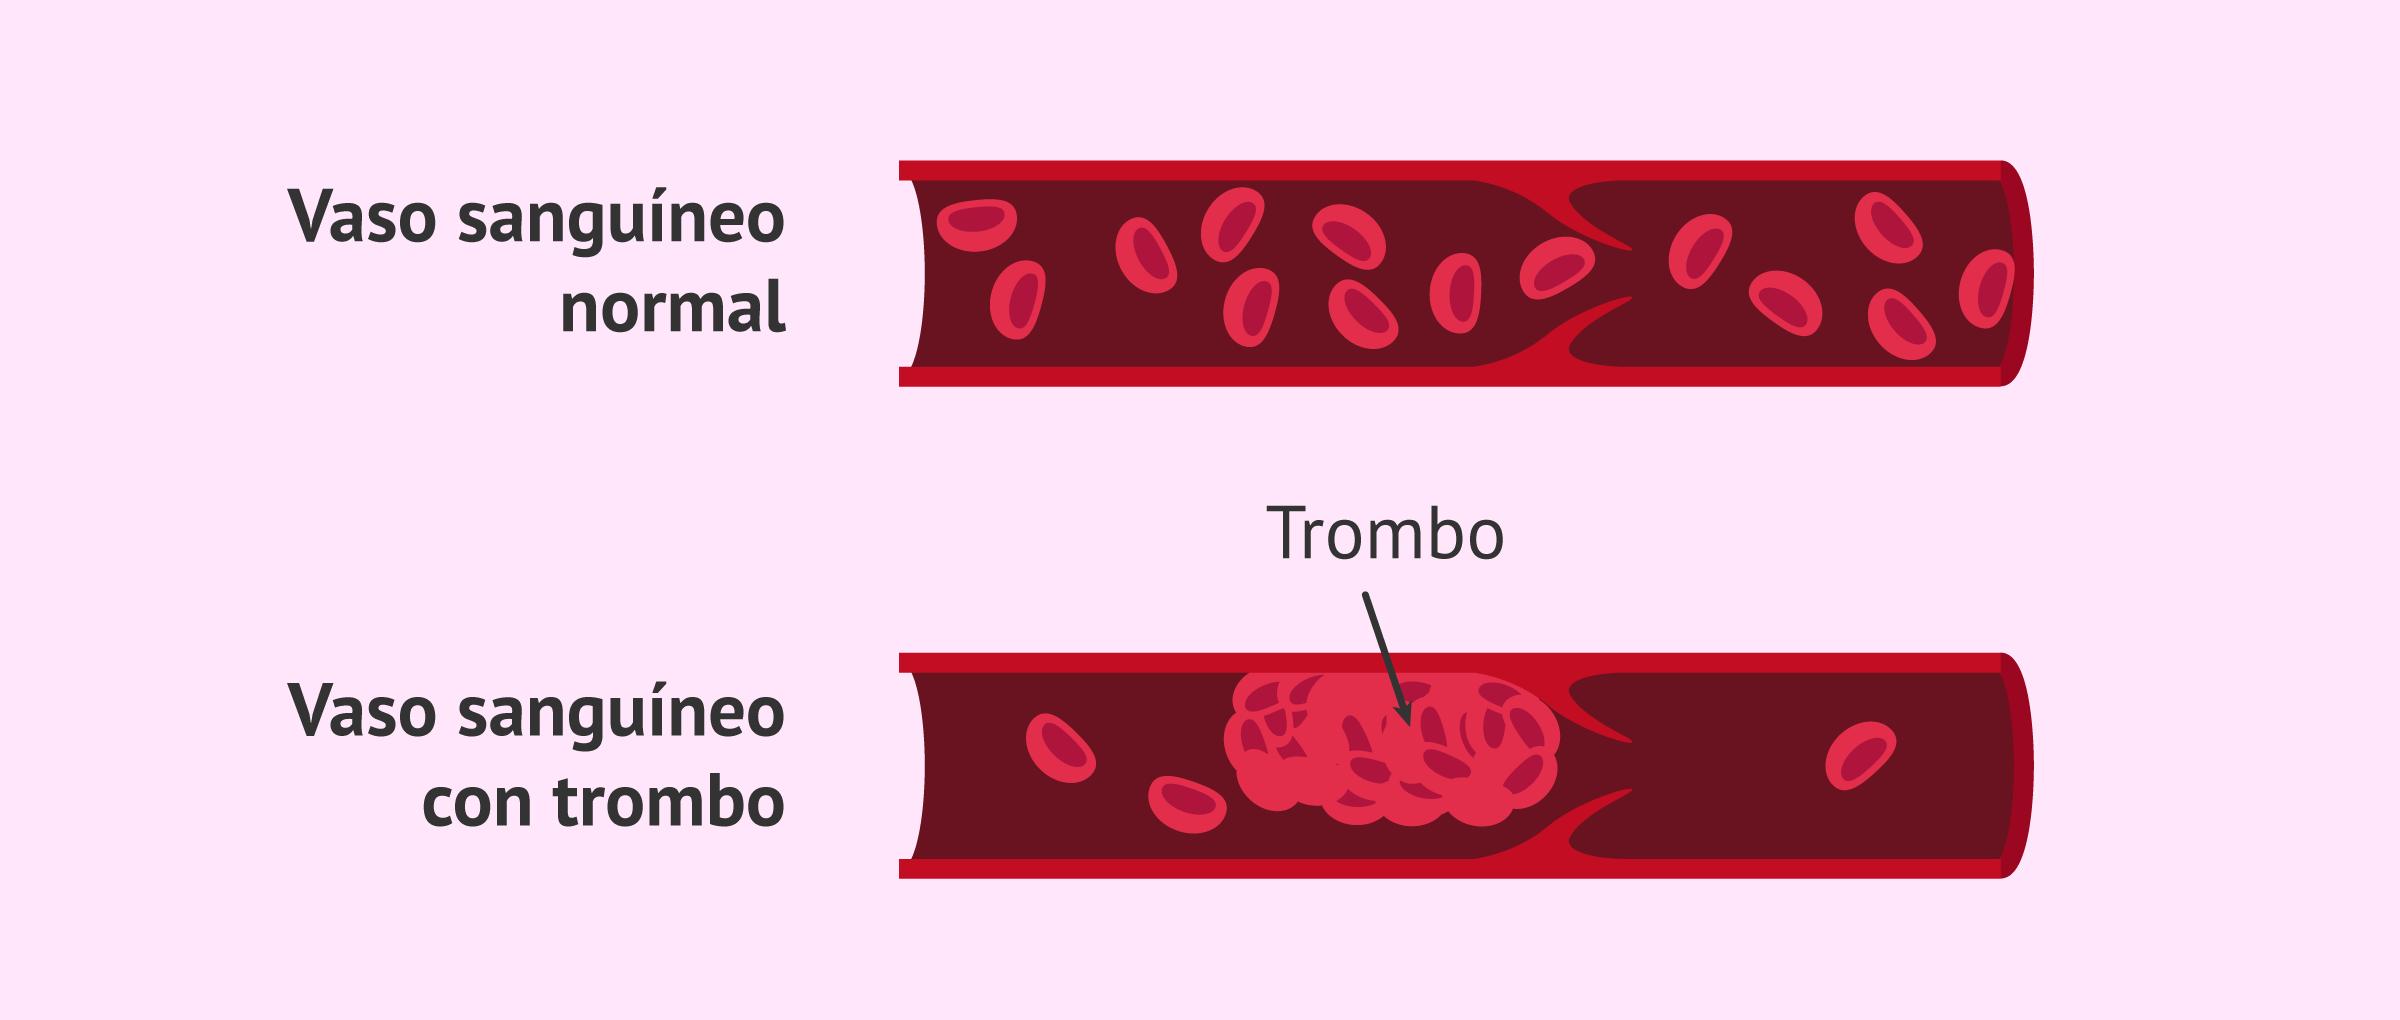 Trombofilia y embarazo